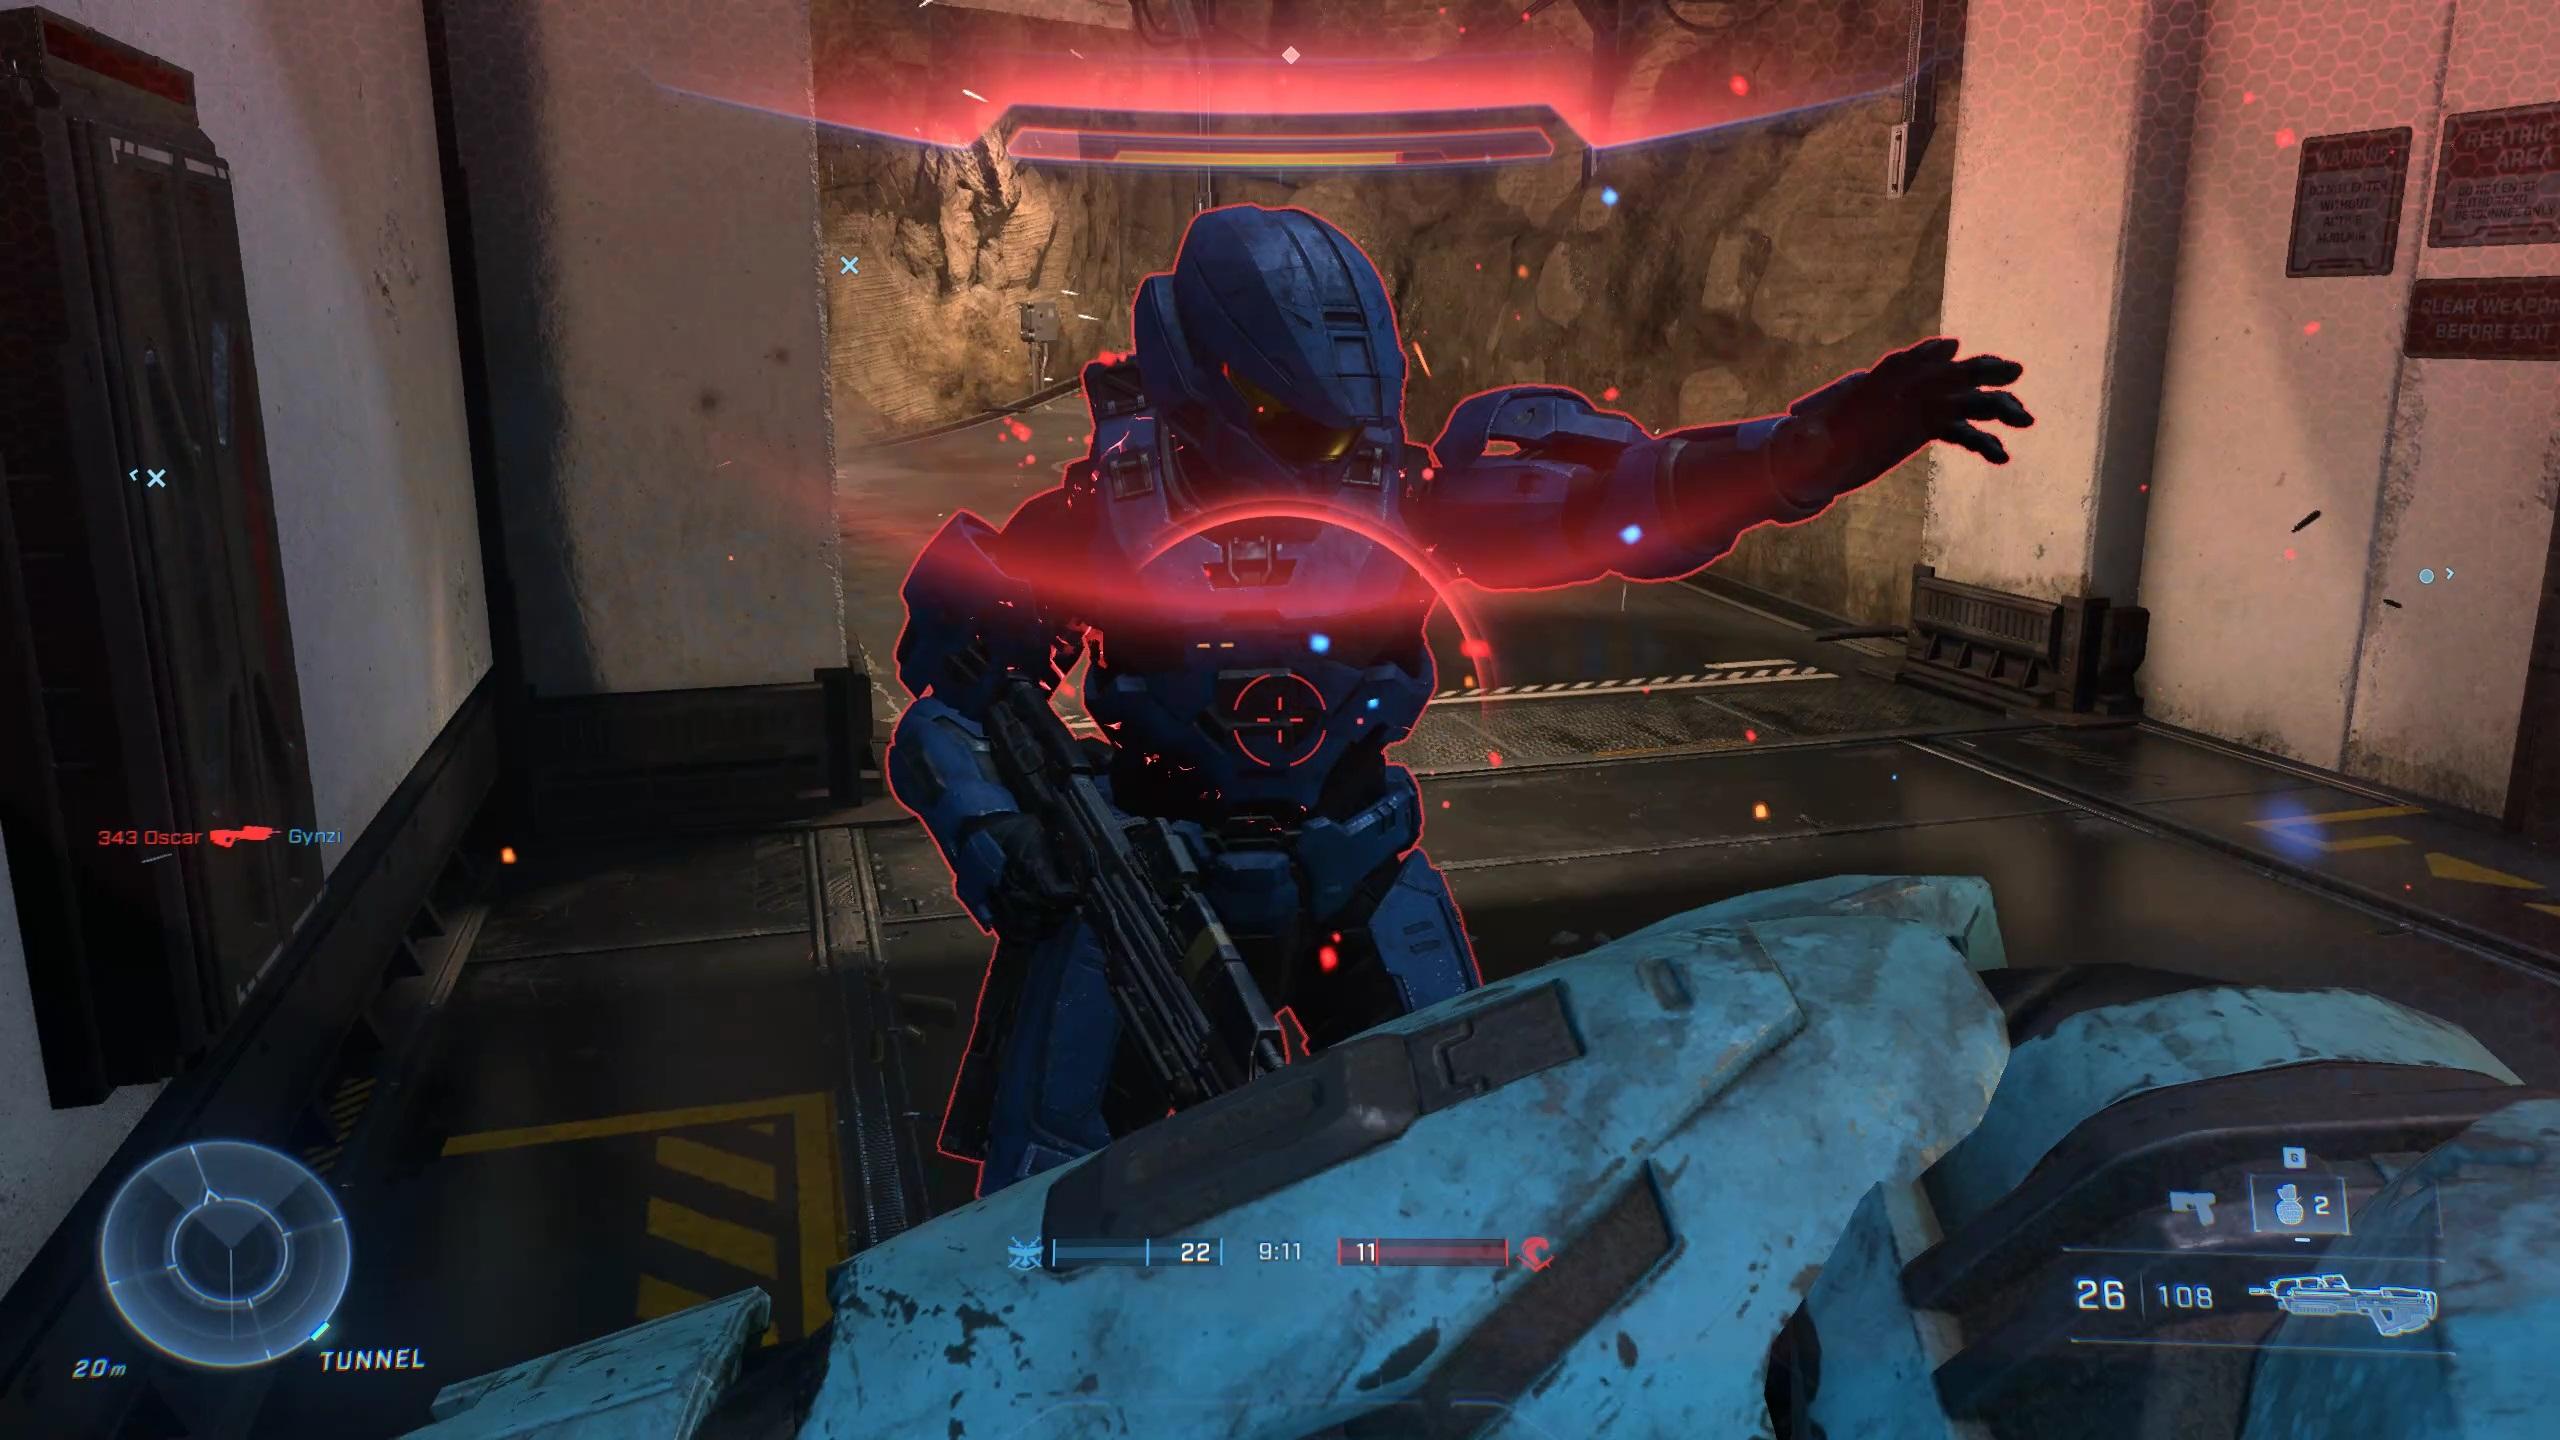 Halo Infinite outline close-up